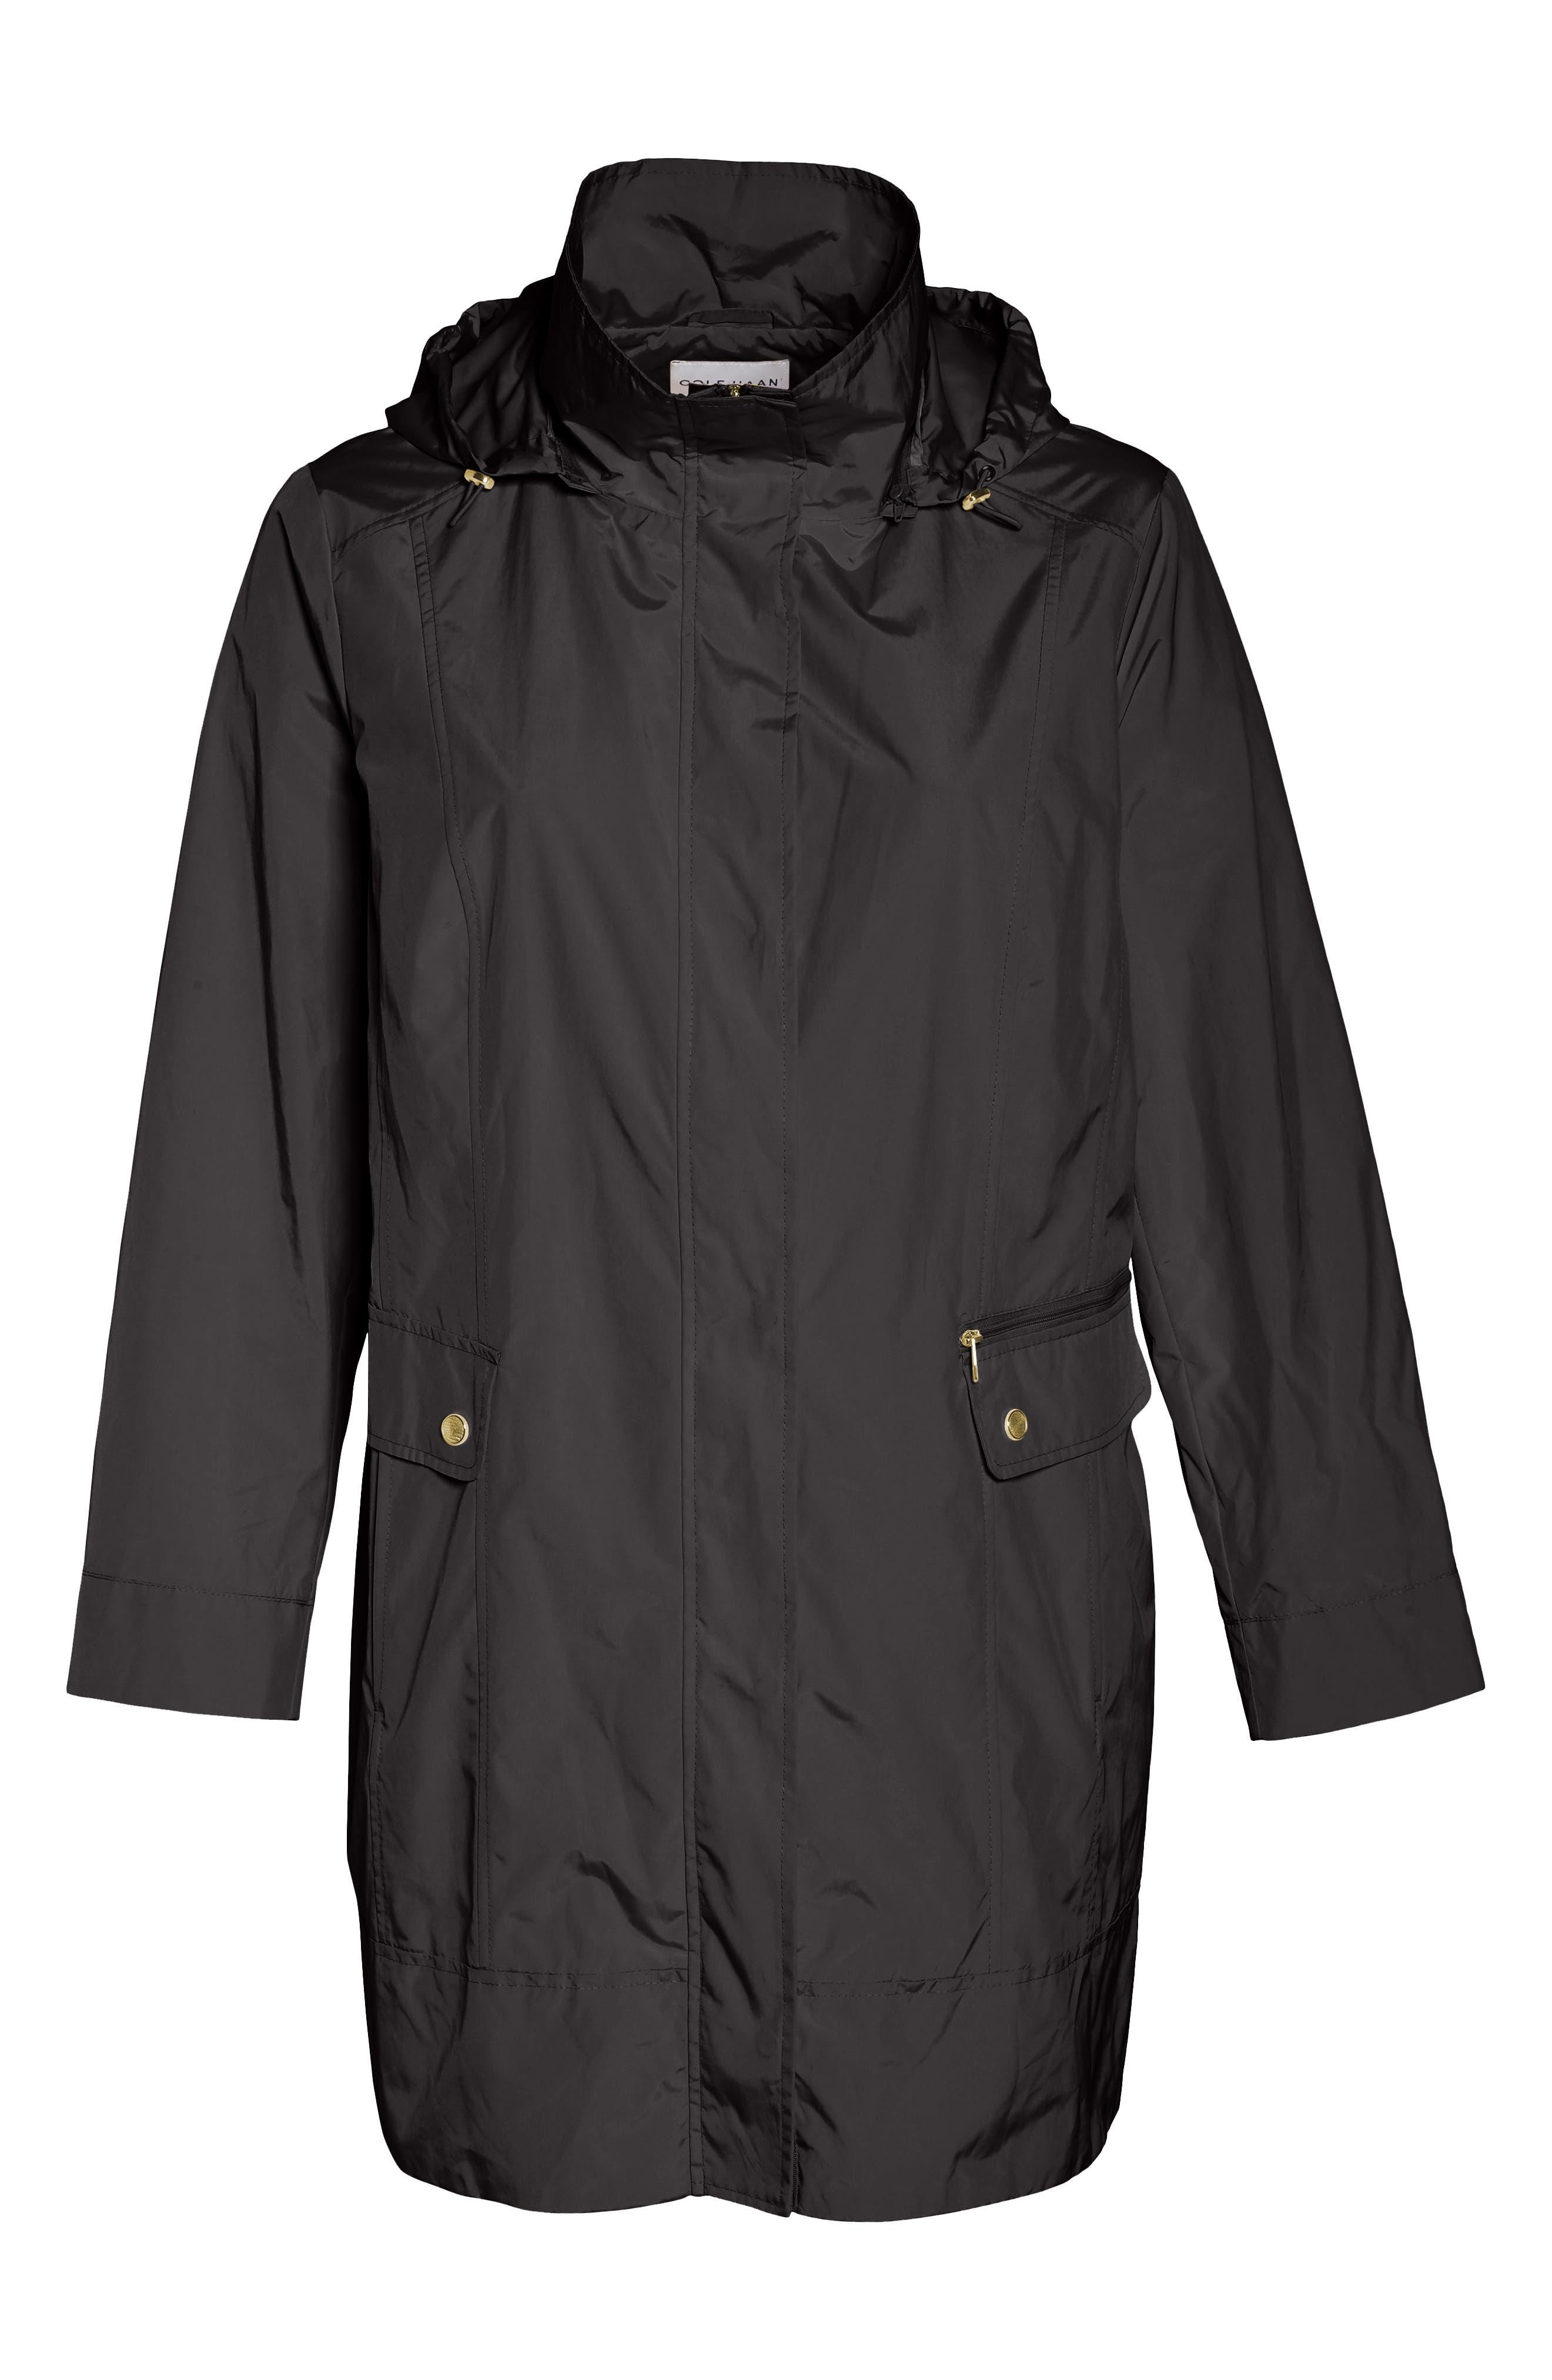 Cole Haan Water Resistant Rain Jacket,                             Main thumbnail 1, color,                             Black